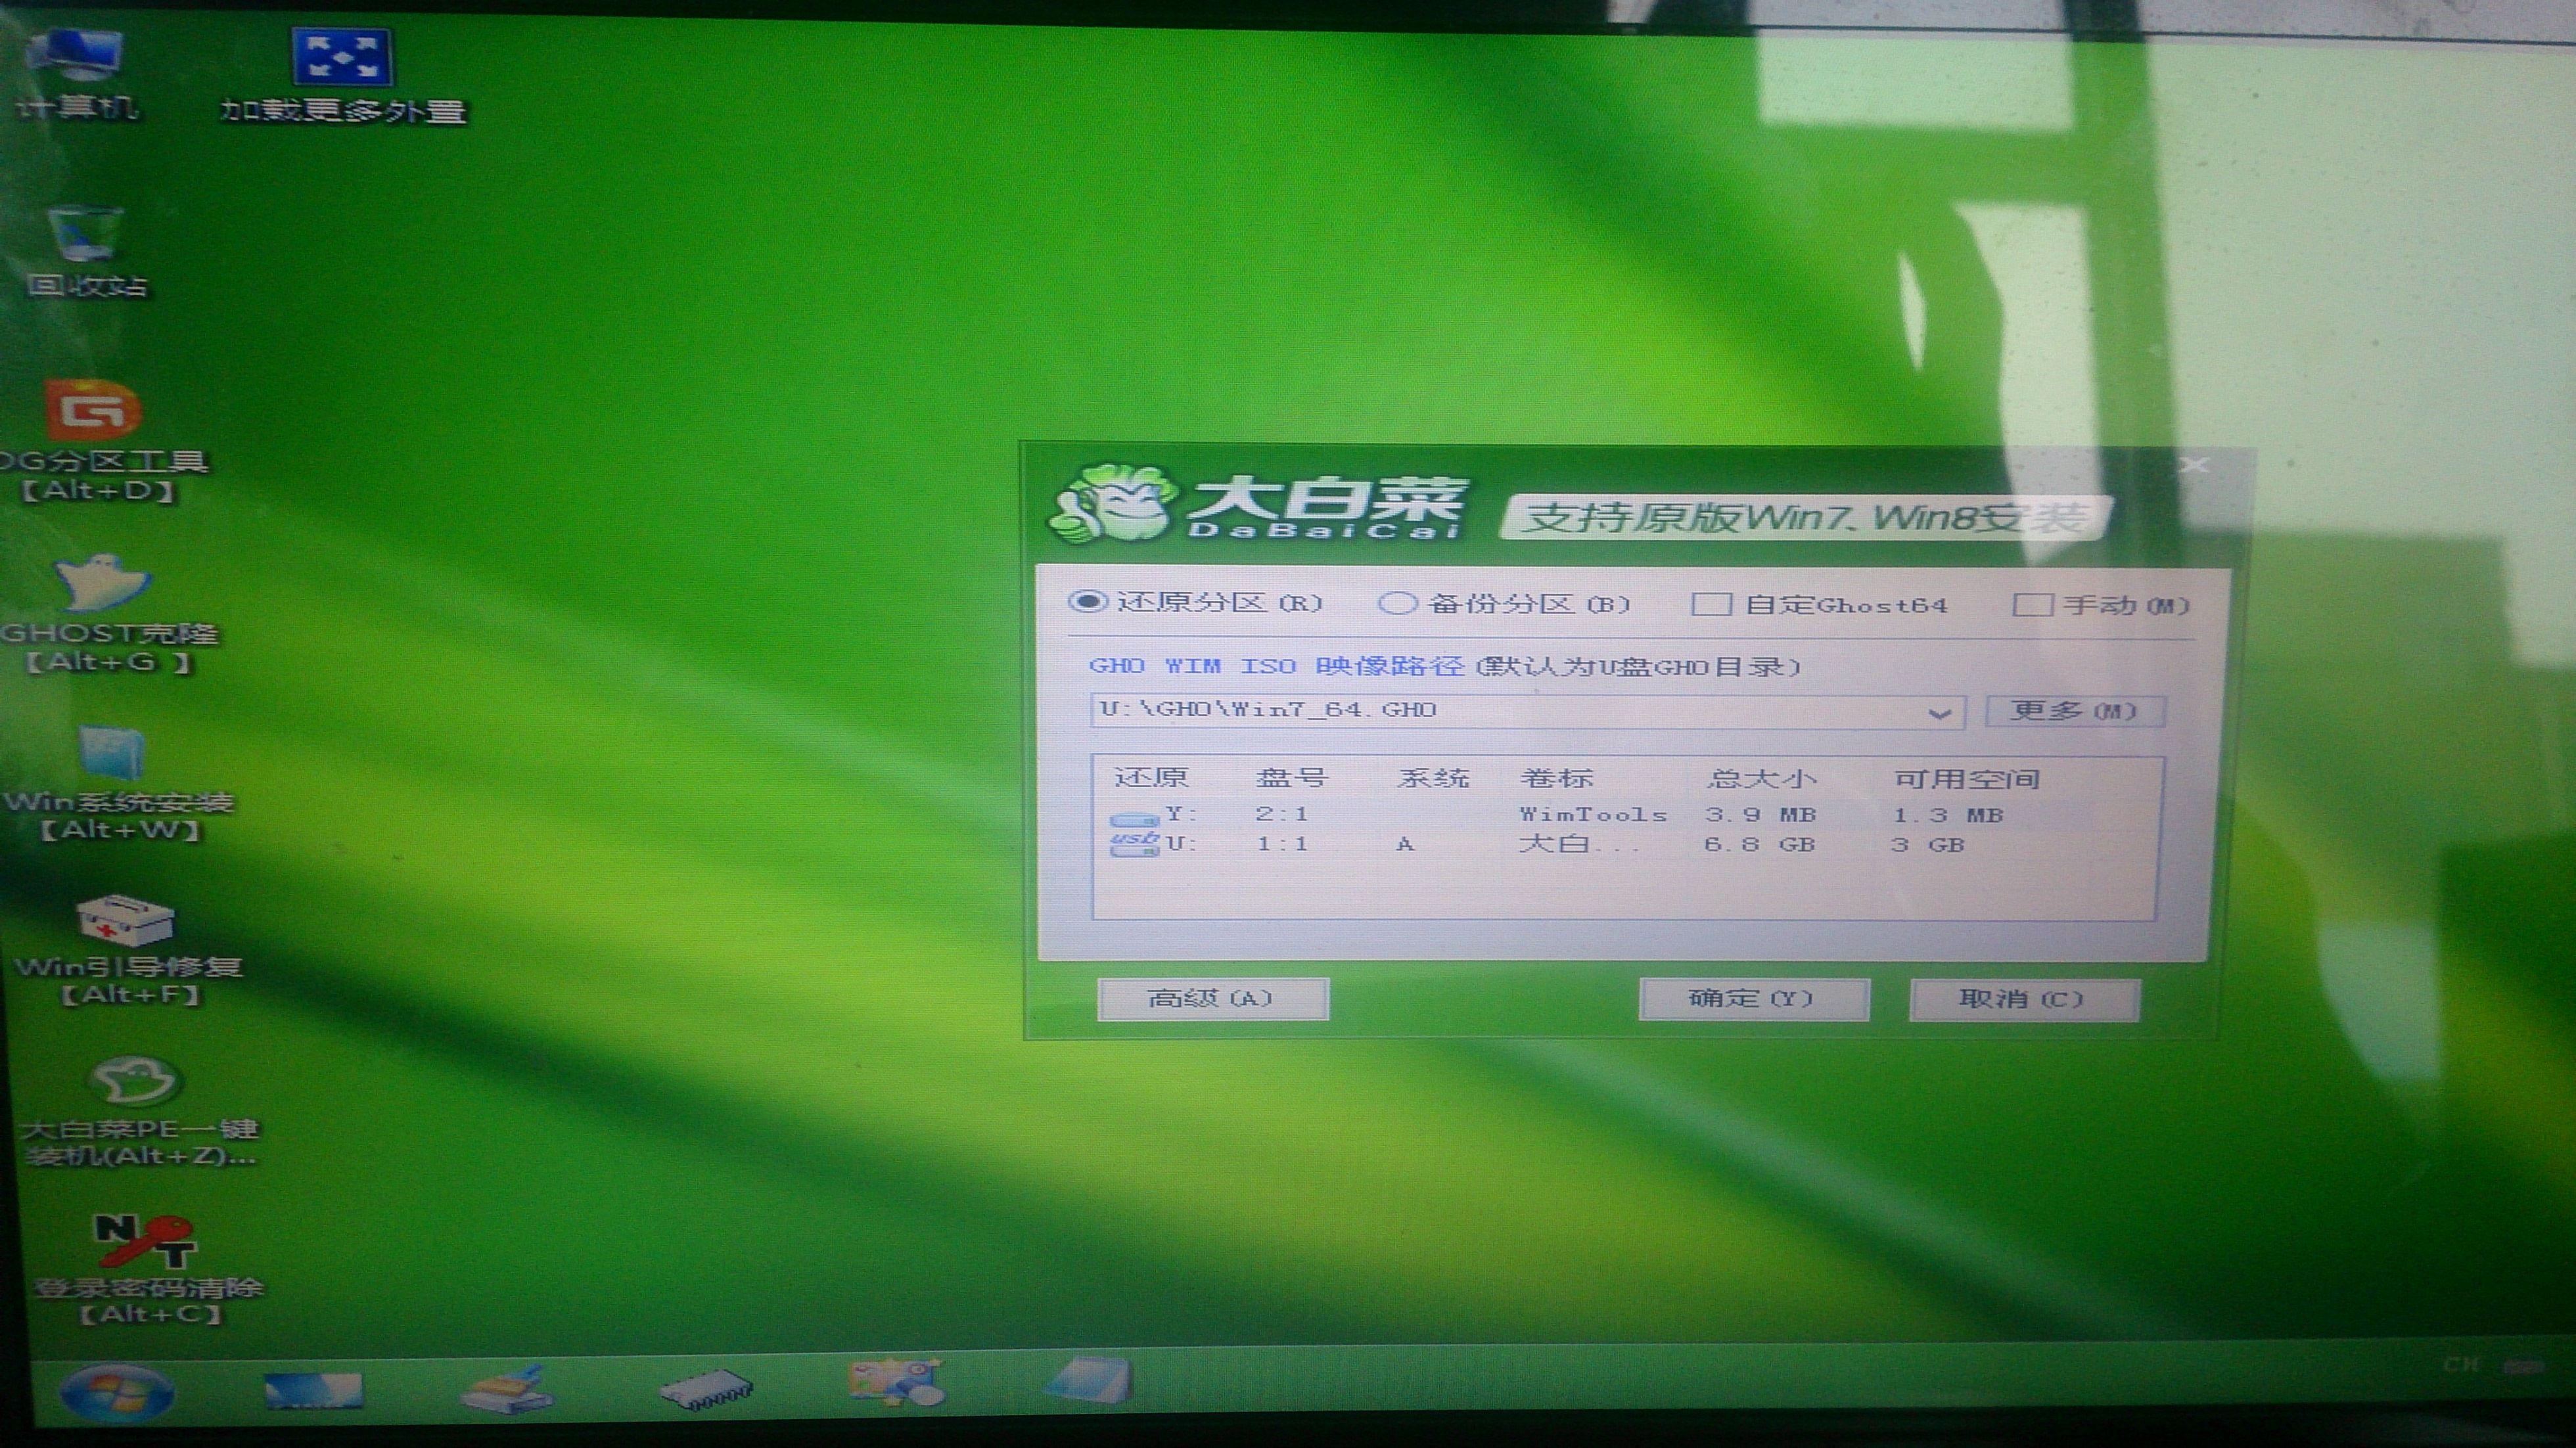 bios无法修改硬盘模式(sata mode),winpe装系统无法识别硬盘